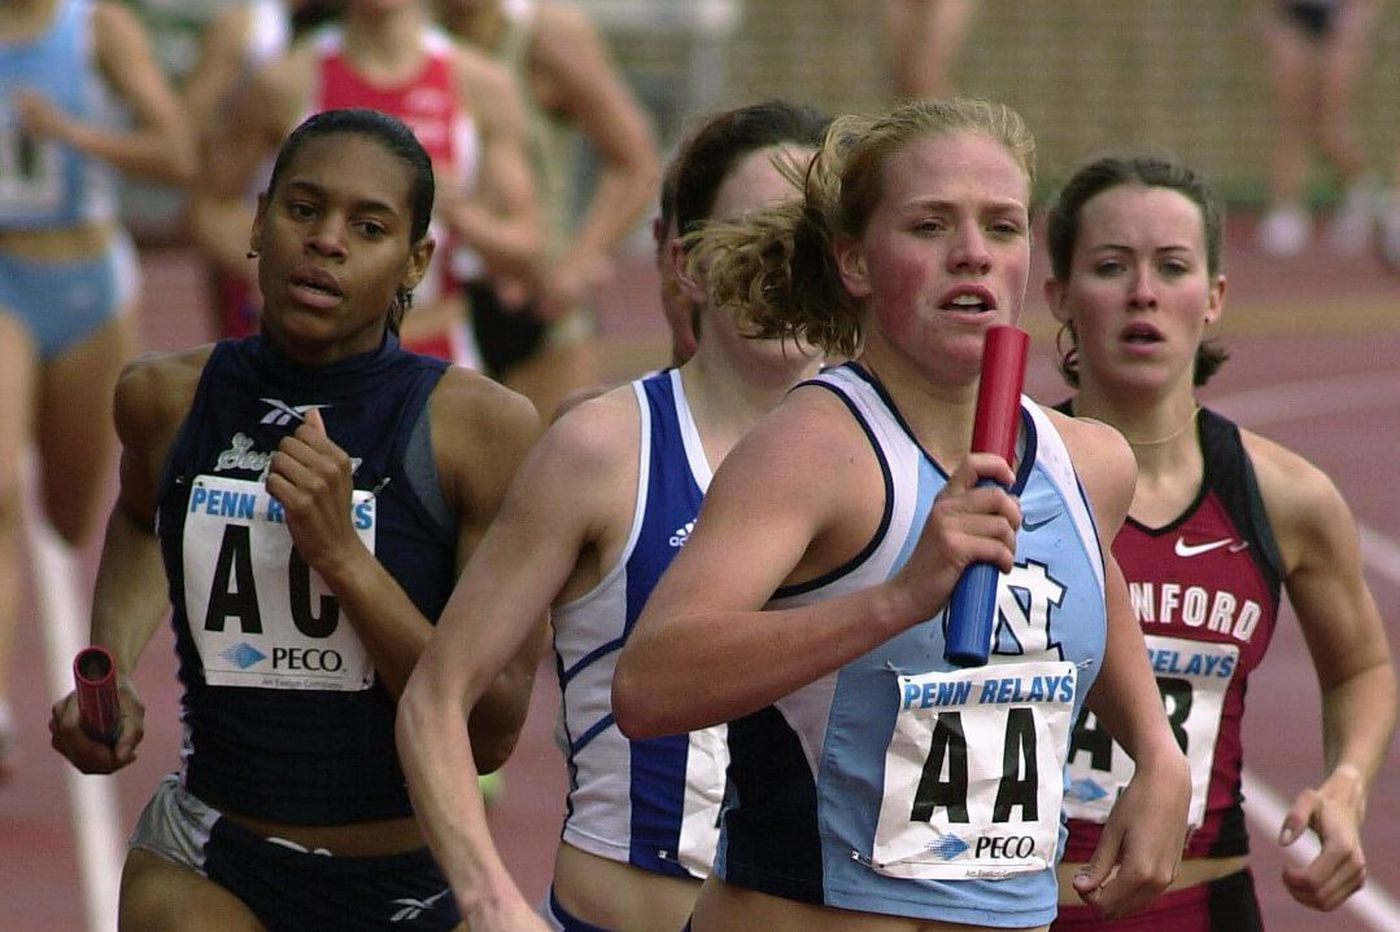 Former U.S. Olympian Erin Donohue has fond memories of Penn Relays